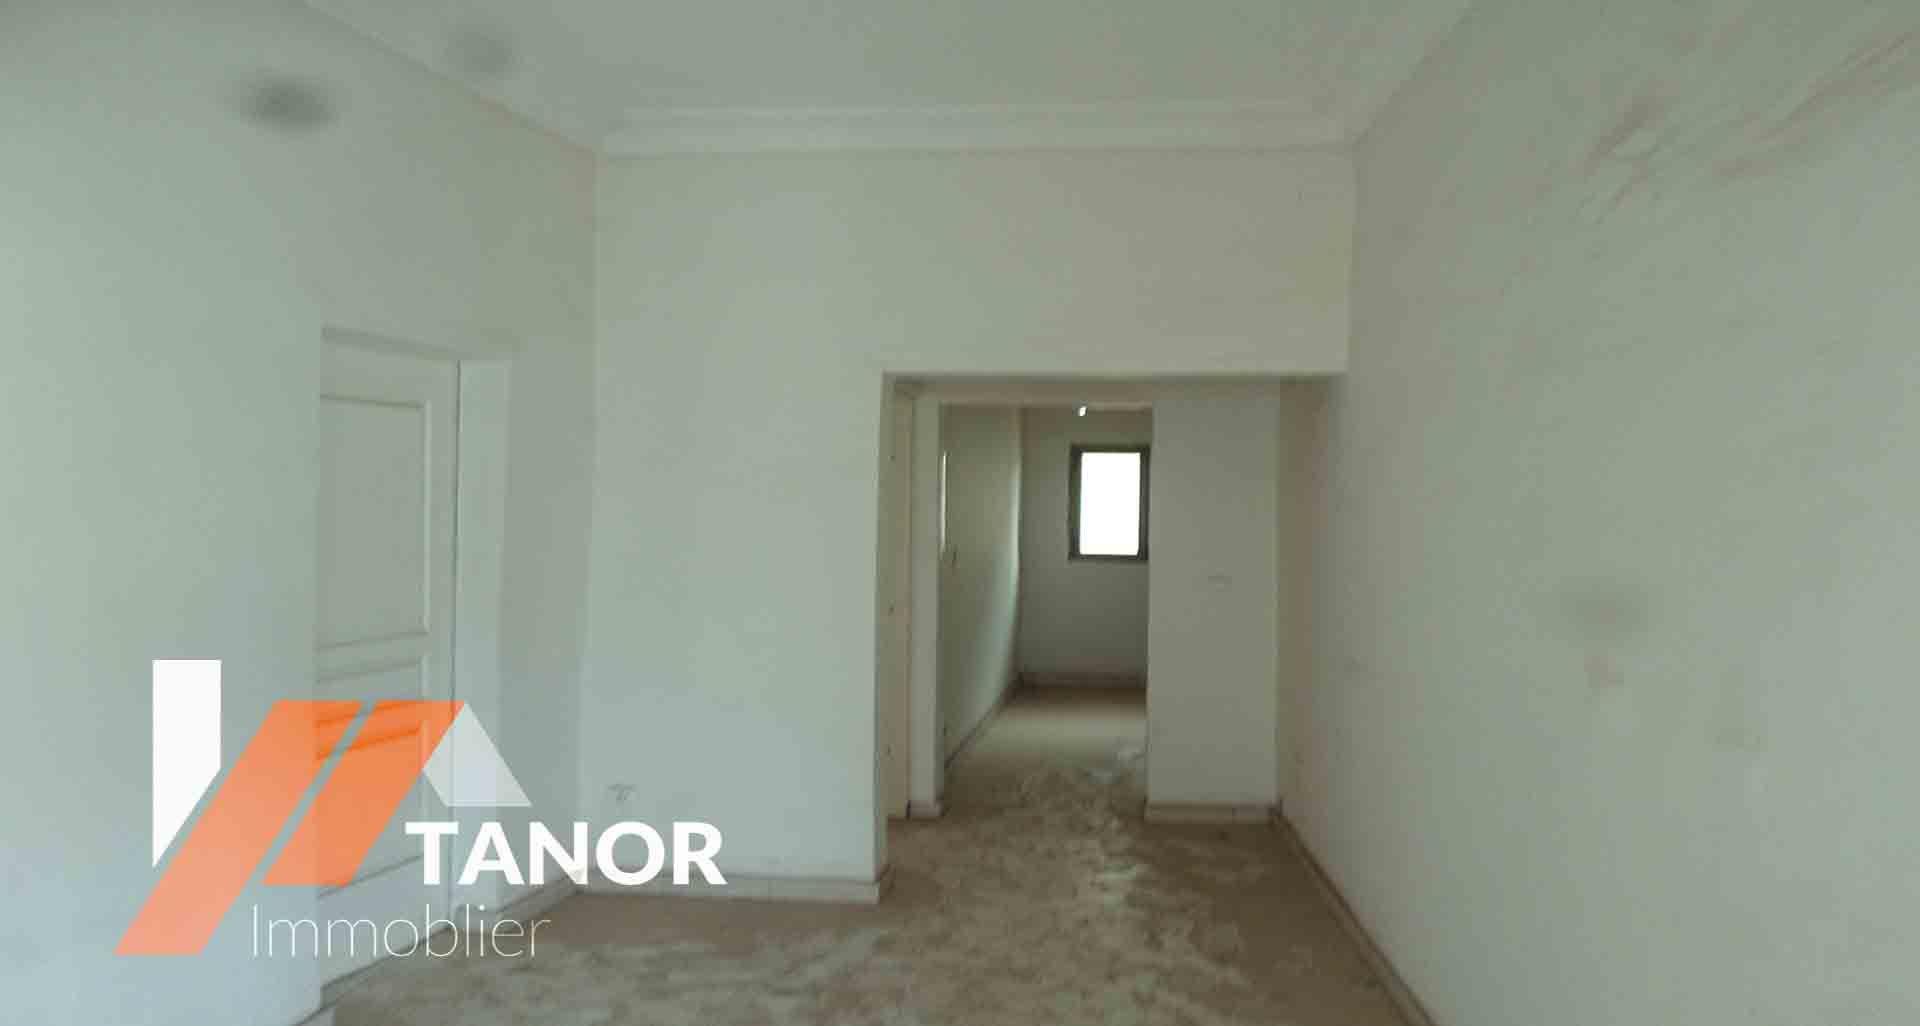 appartement bureau magasin a louer aci 2000 immobilier bamako location bamako agence. Black Bedroom Furniture Sets. Home Design Ideas